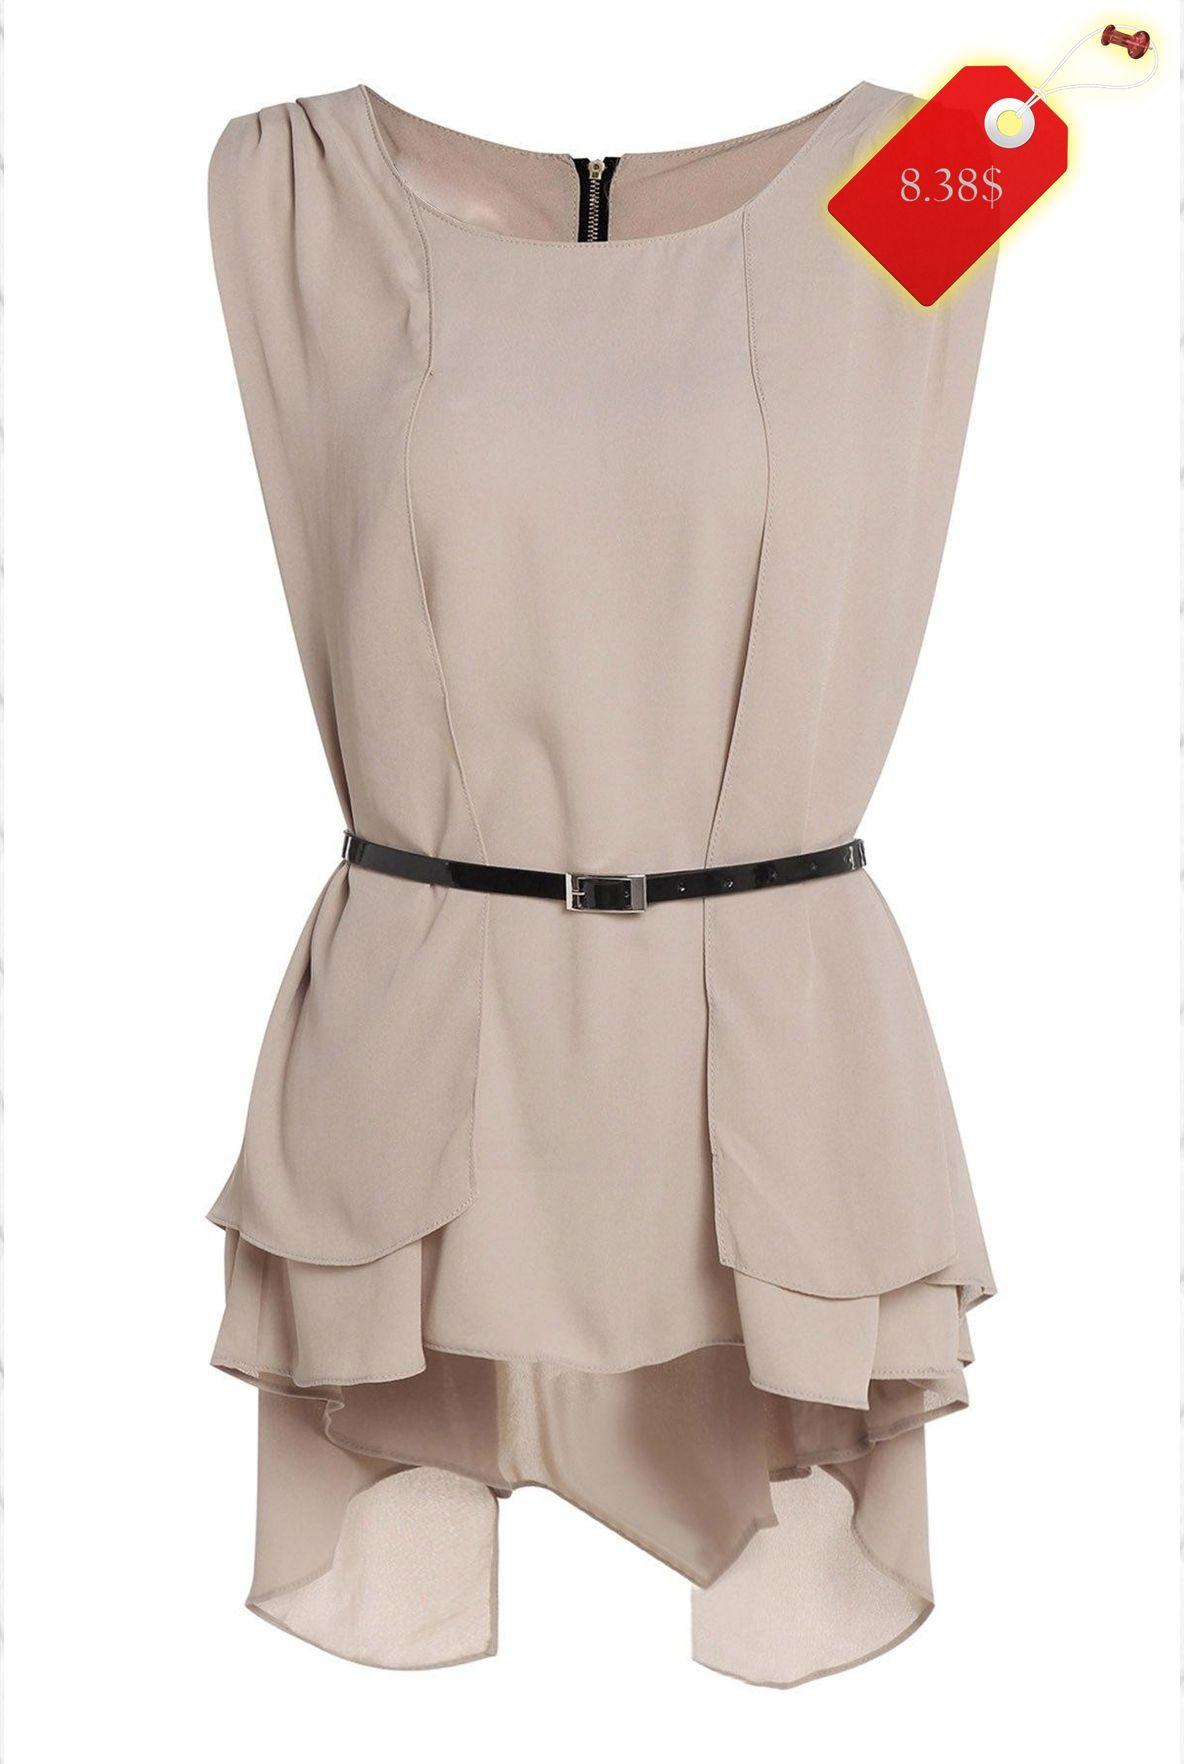 Simple design sleeveless scoop neck ruffled chiffon blouse for women